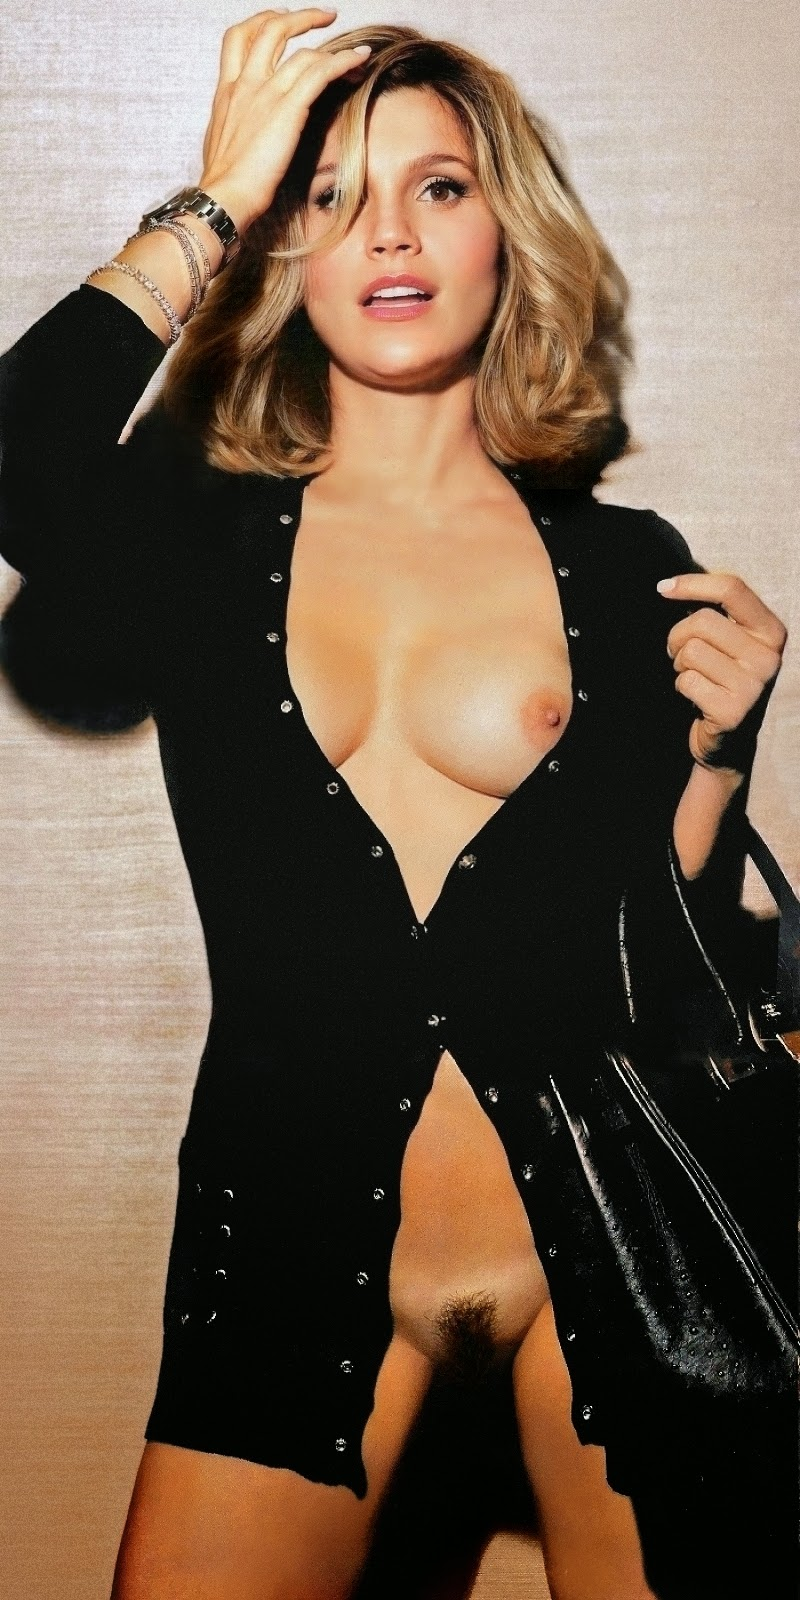 Flavia Playboy nude brazilian divas: flavia alessandra